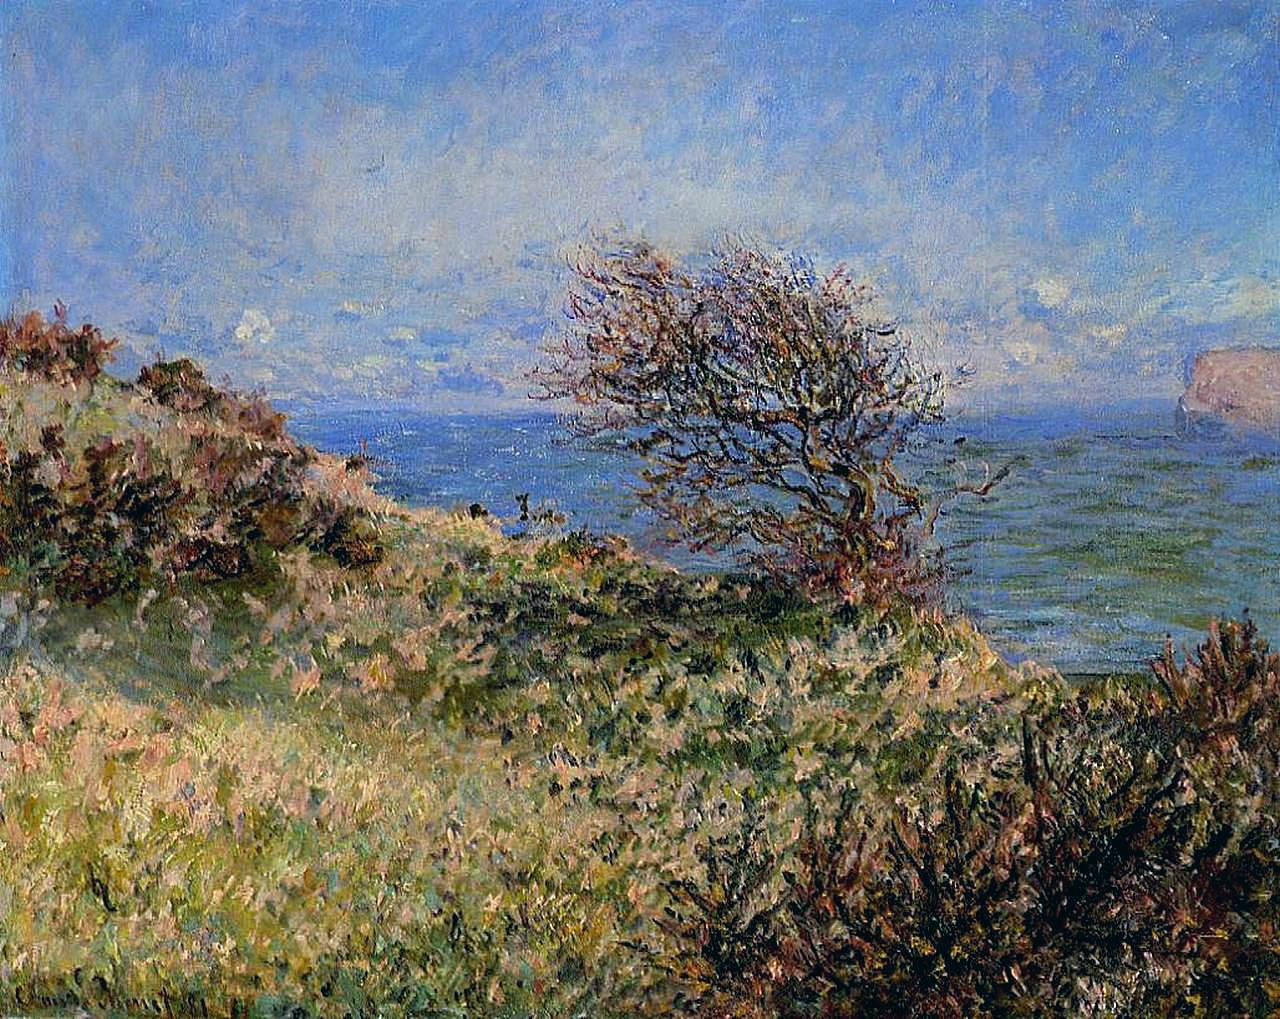 южные пейзажи < На утёсе в Фекаме >:: Клод Моне, описание картины - Моне Клод (Claude Monet) фото